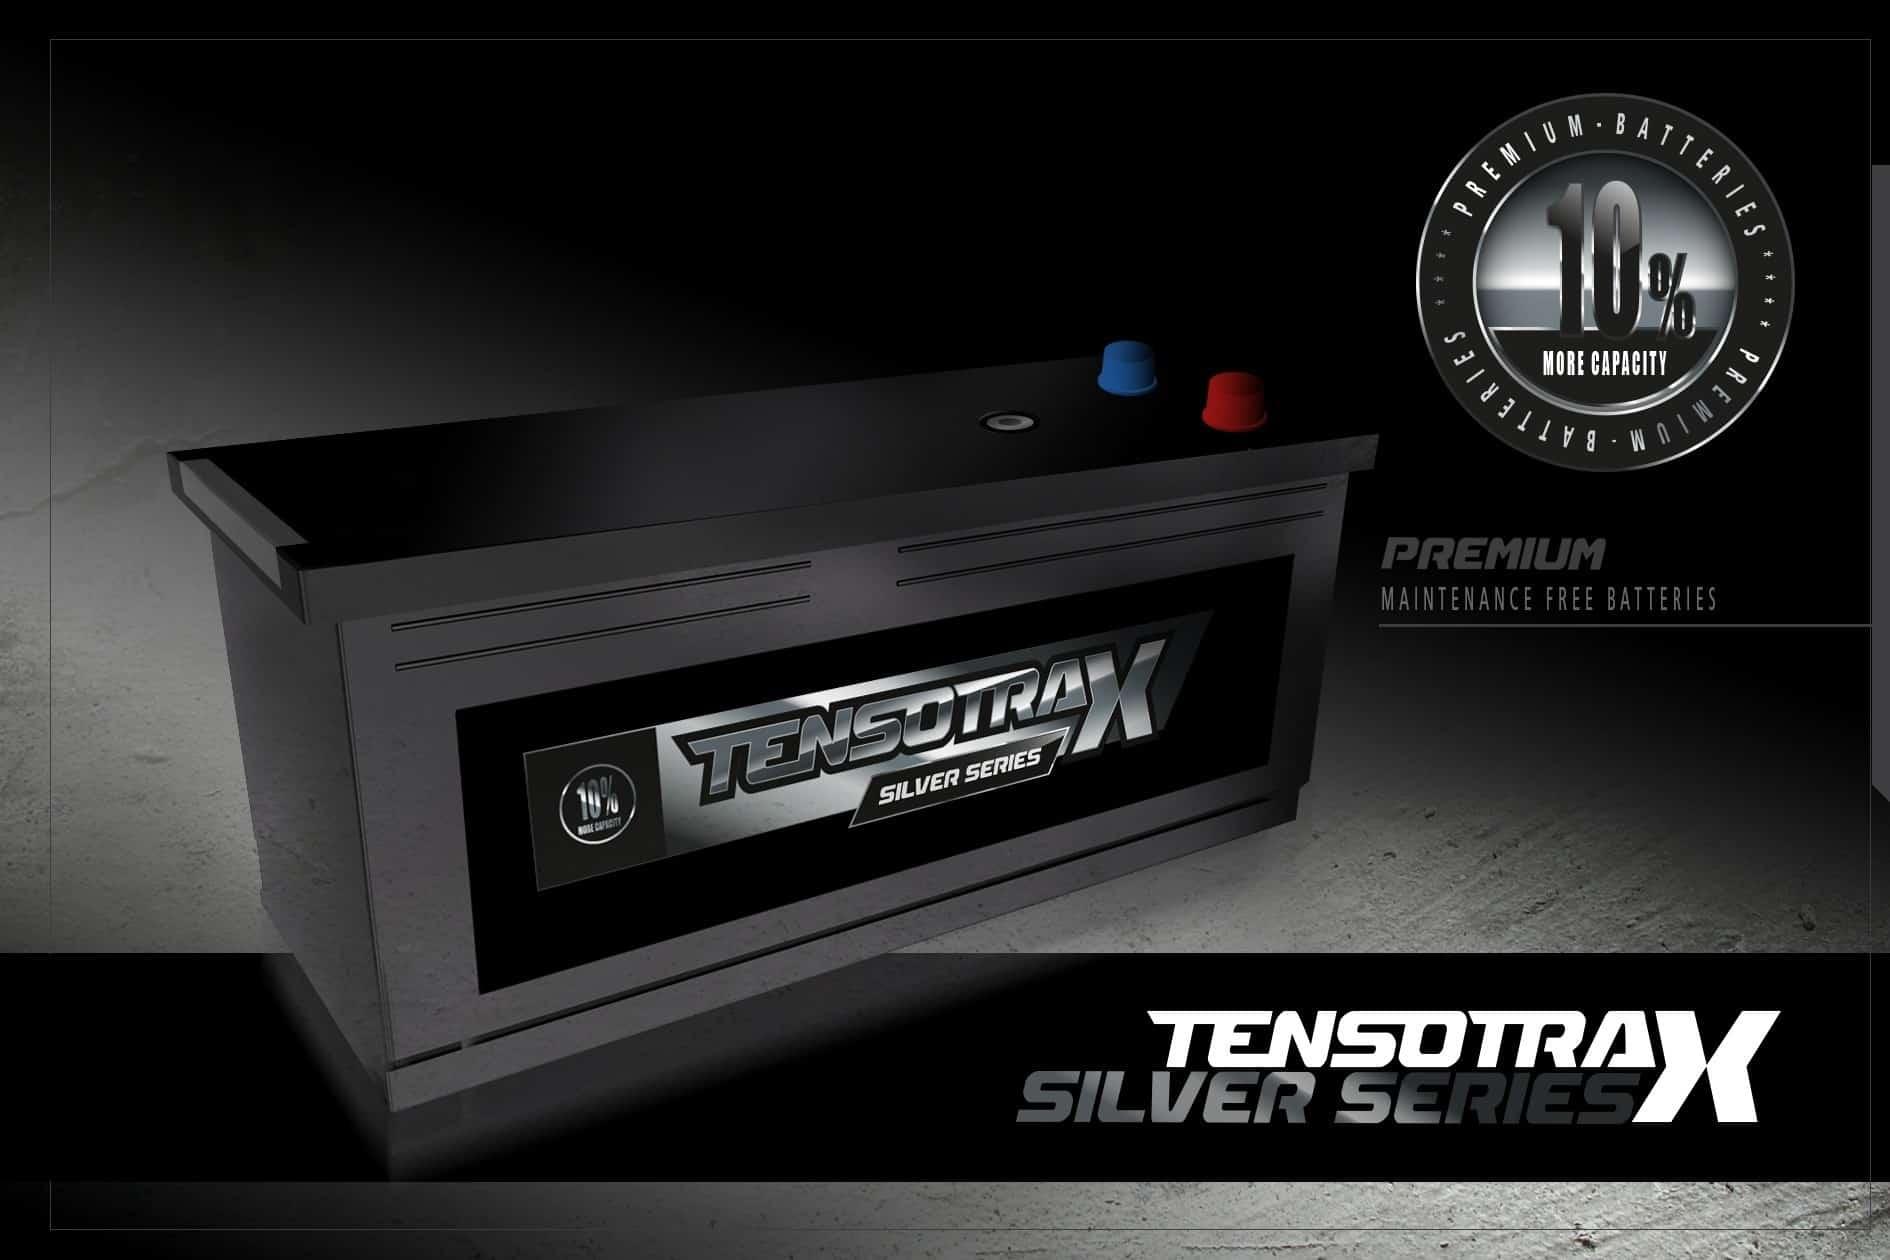 4 x 12 VOLT 250Ah Semi Tractie Accu ( Start / Licht ) onderhoudsvrij gesloten Tensotrax + WINDMOLEN 12V of 24V-0